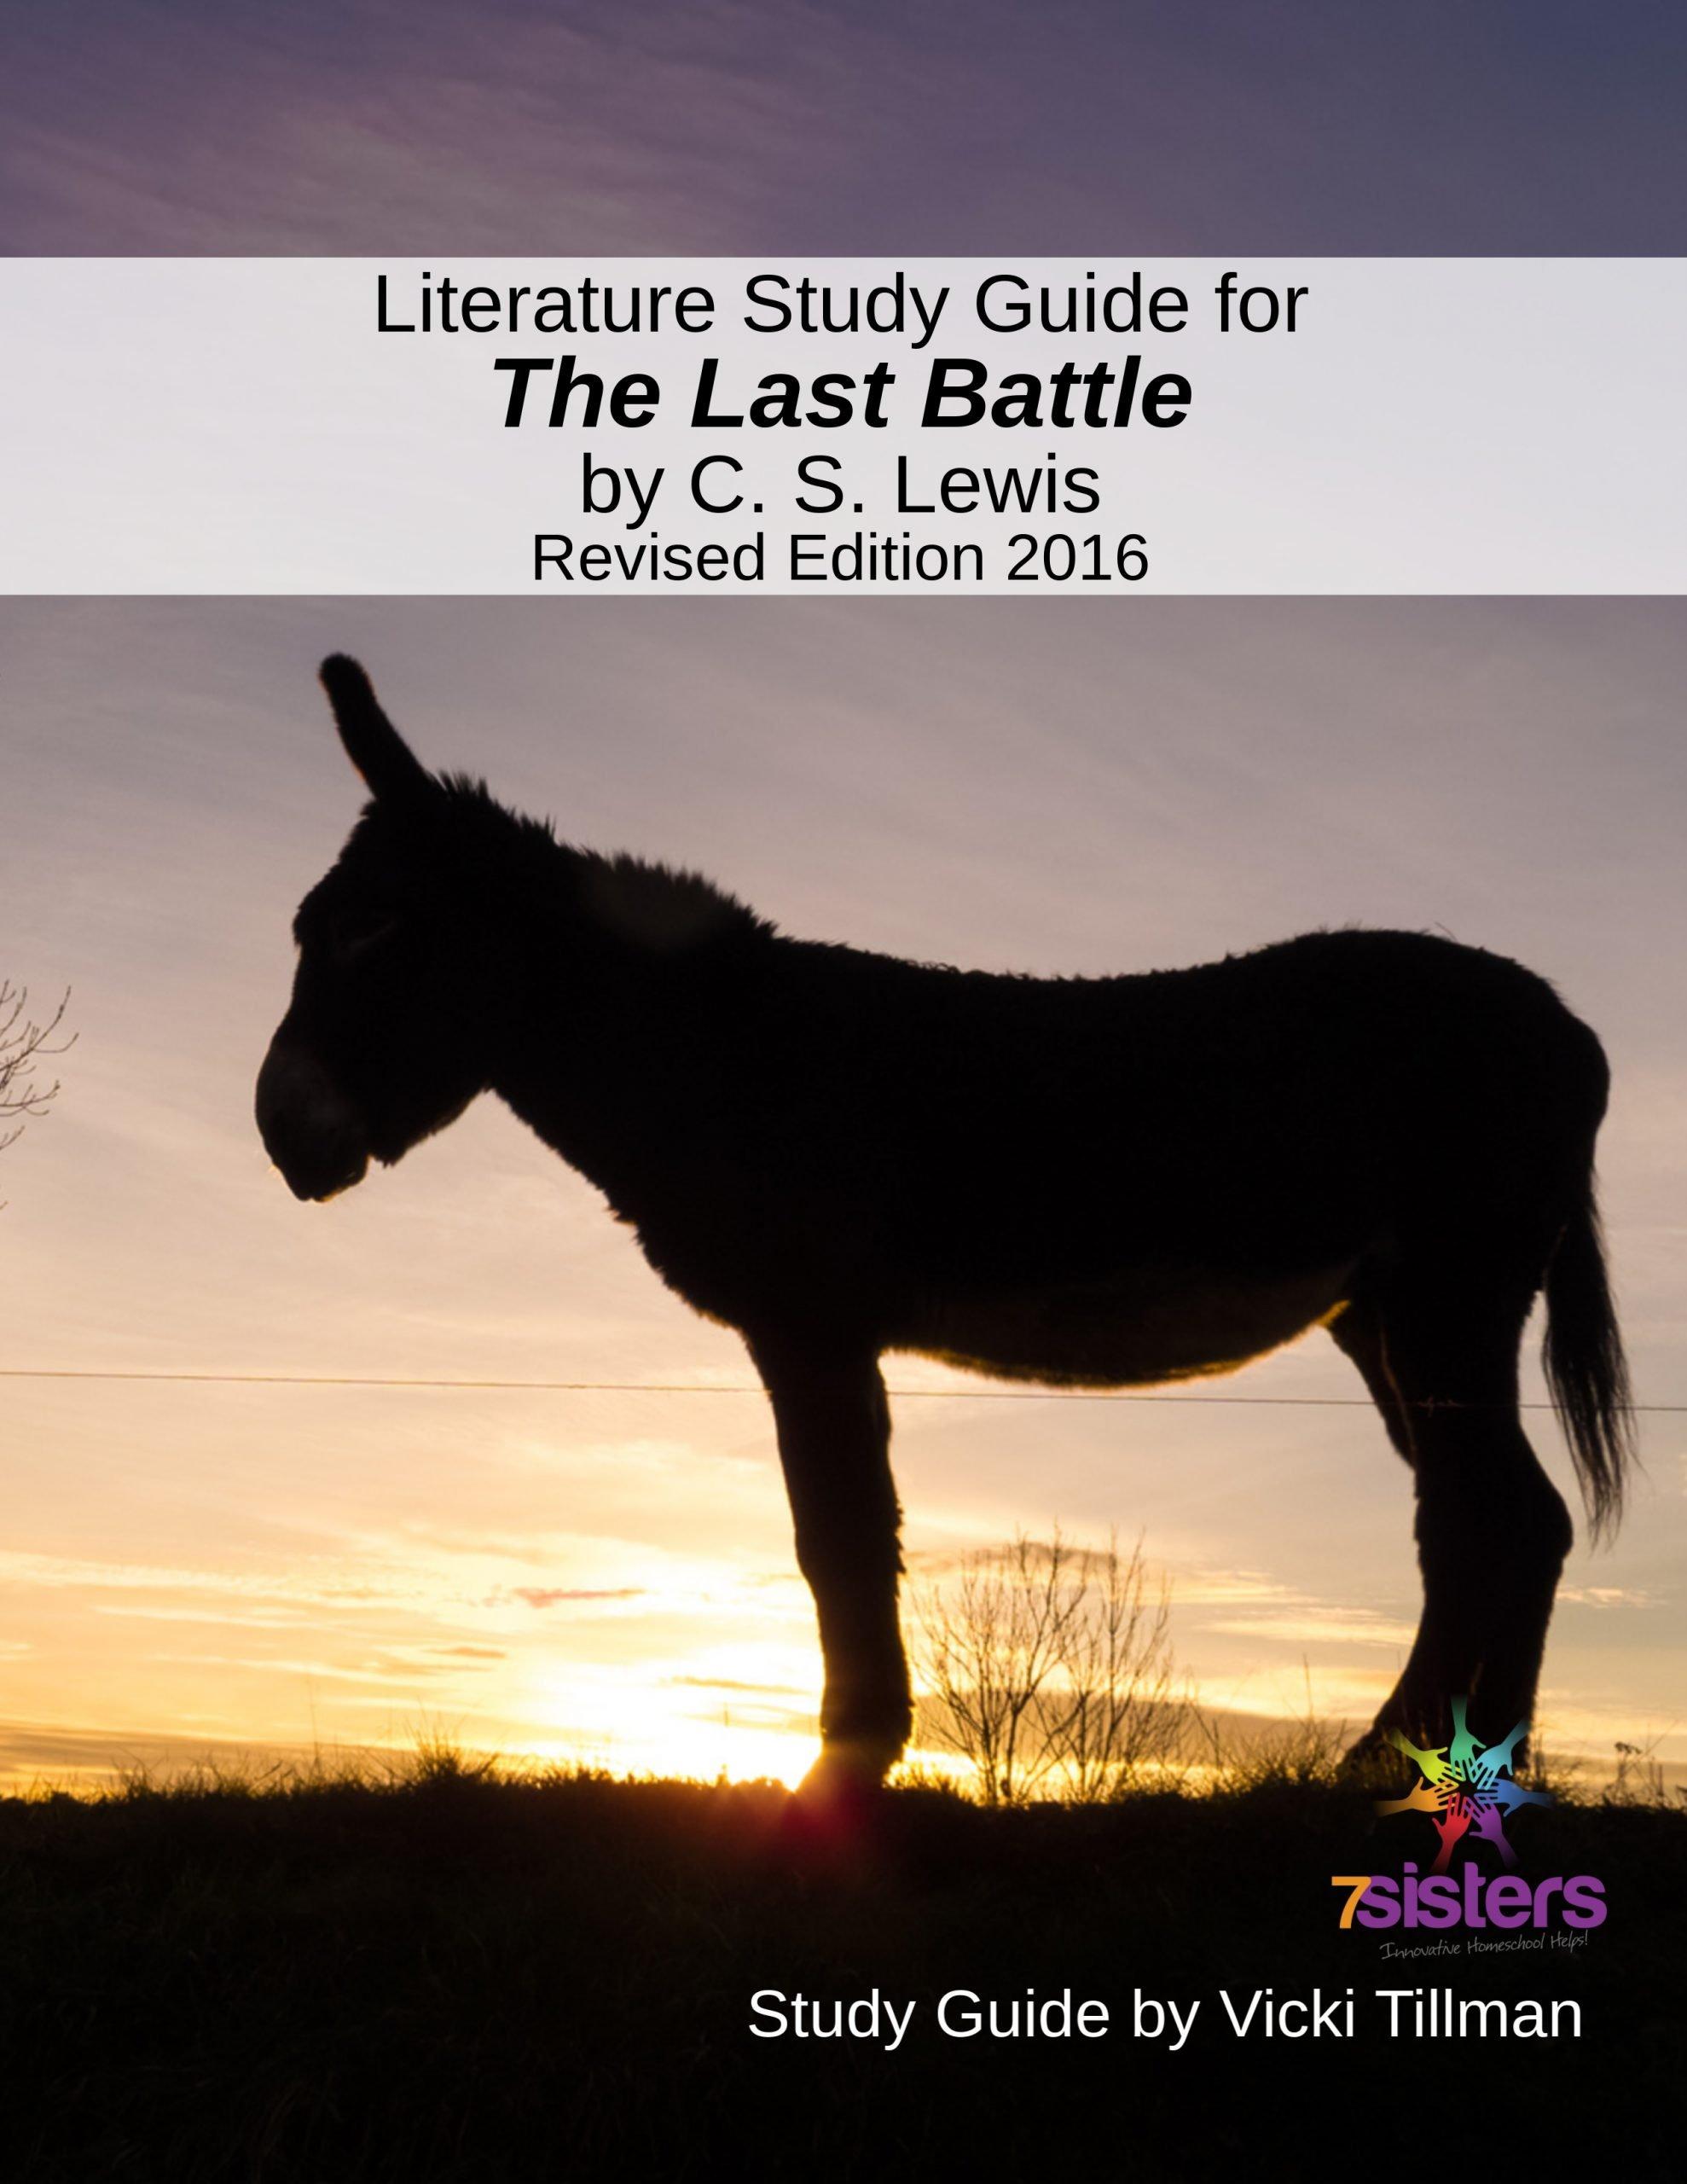 The Last Battle Literature Study Guide